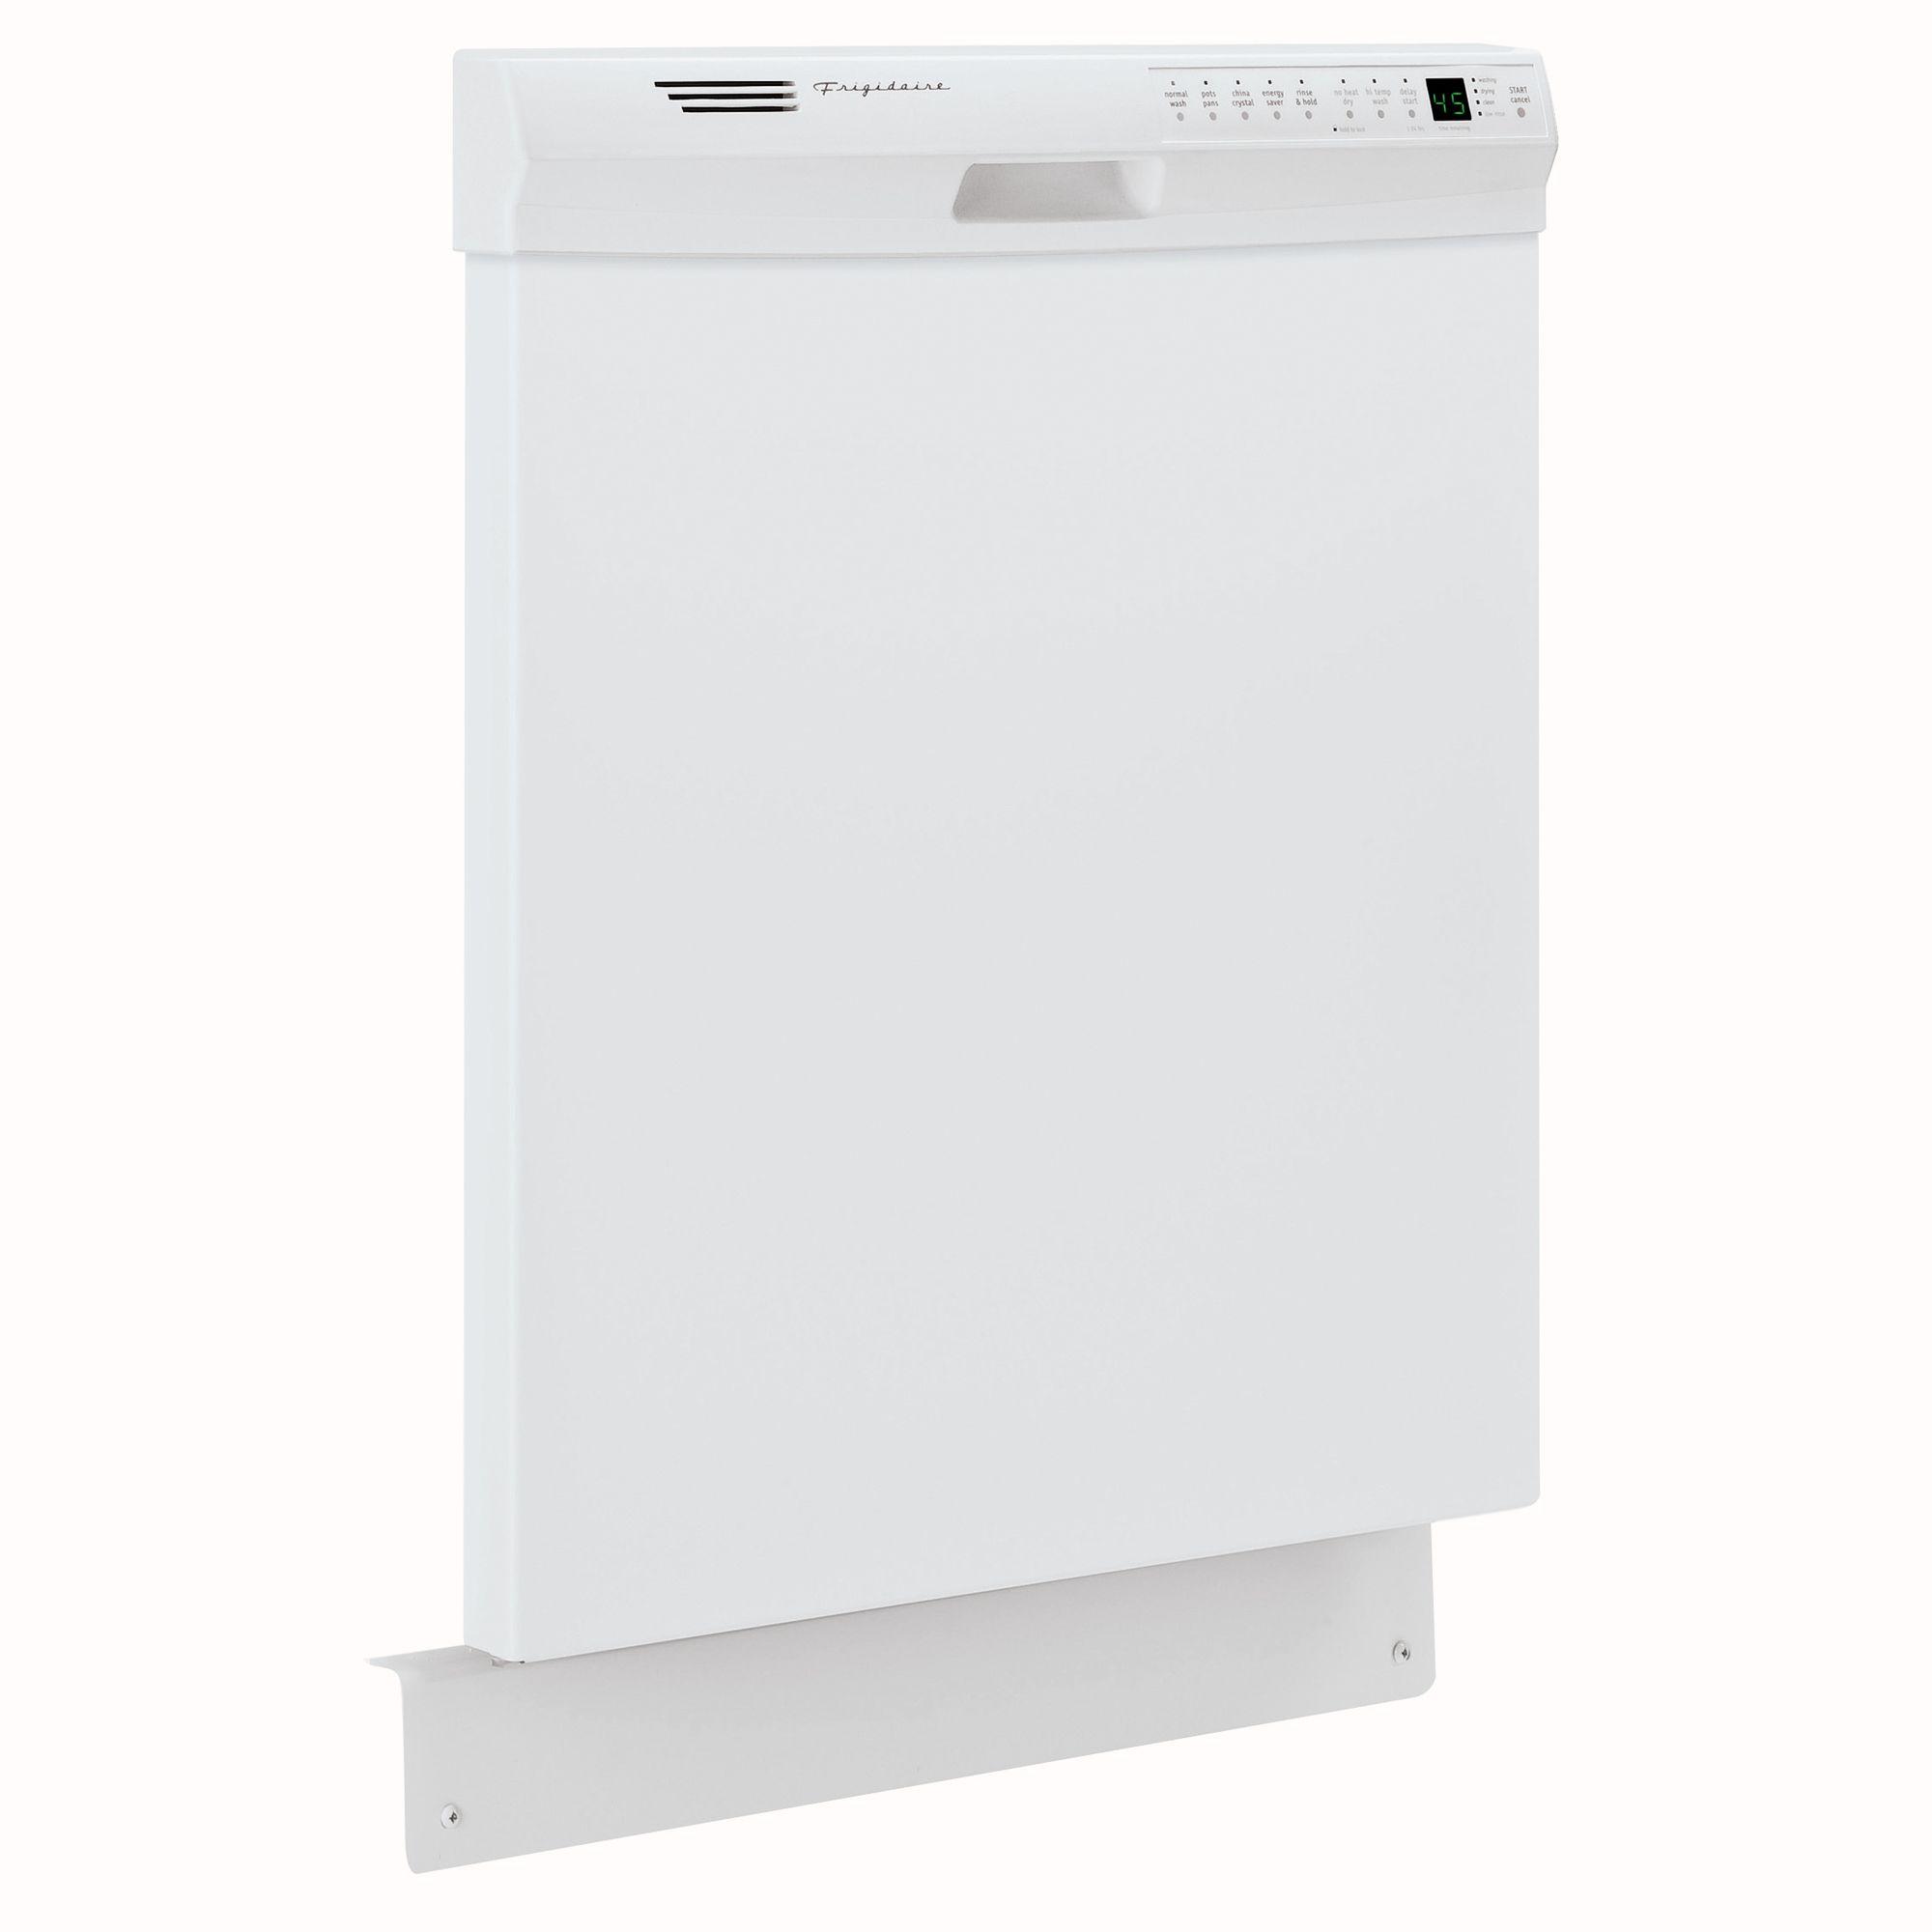 "Frigidaire 24"" Built-In Dishwasher - White"